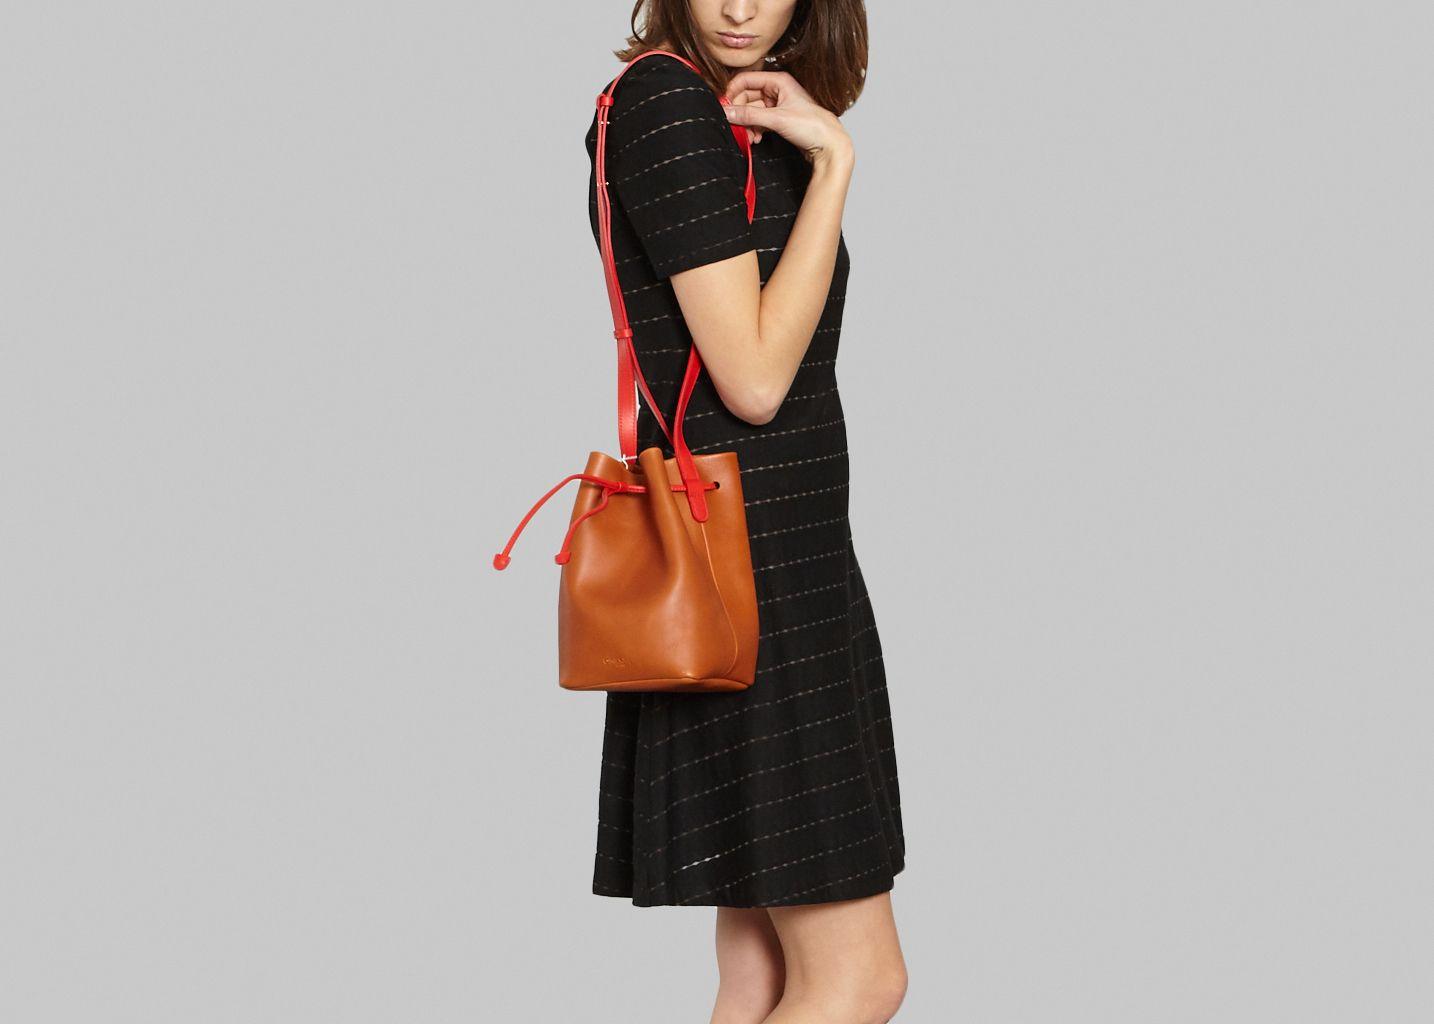 486d8c43b545 Adriana Bag Cognac Olivia Clergue   L Exception